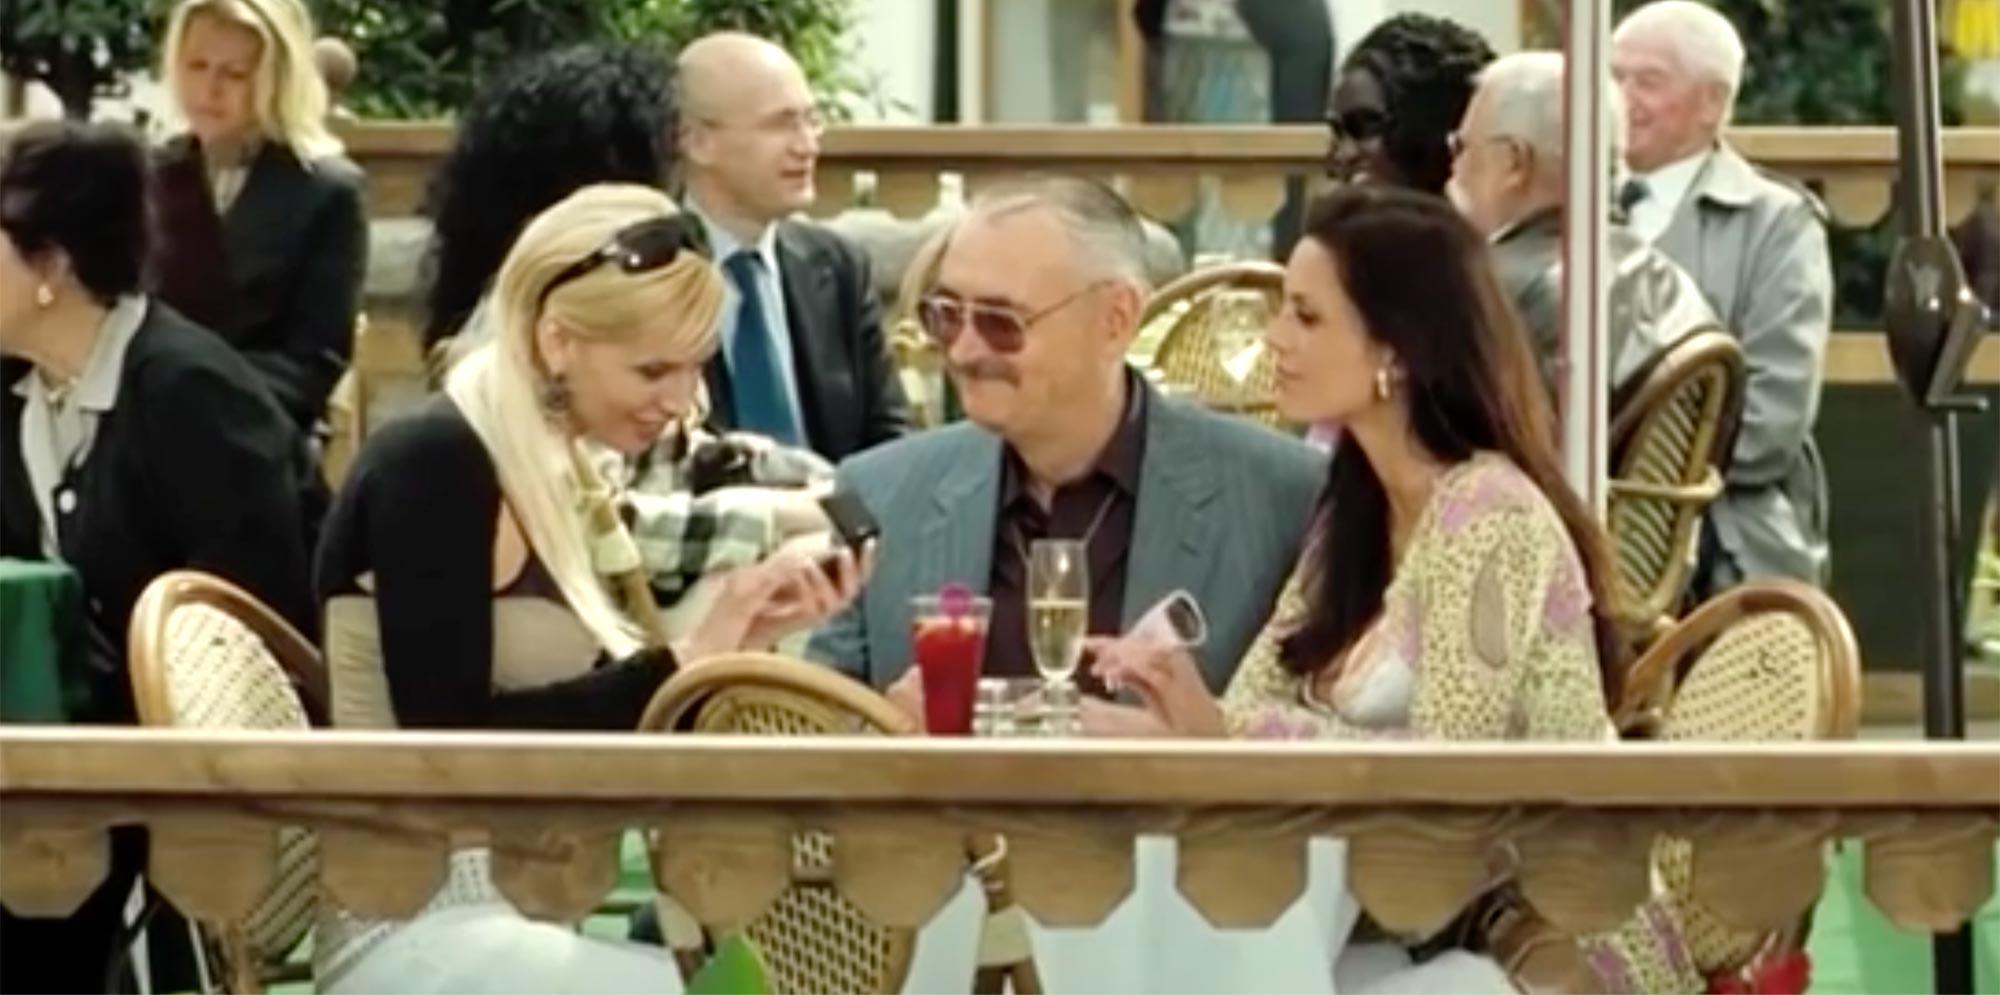 Bond Cameos Michael G. Wilson in Casino Royale